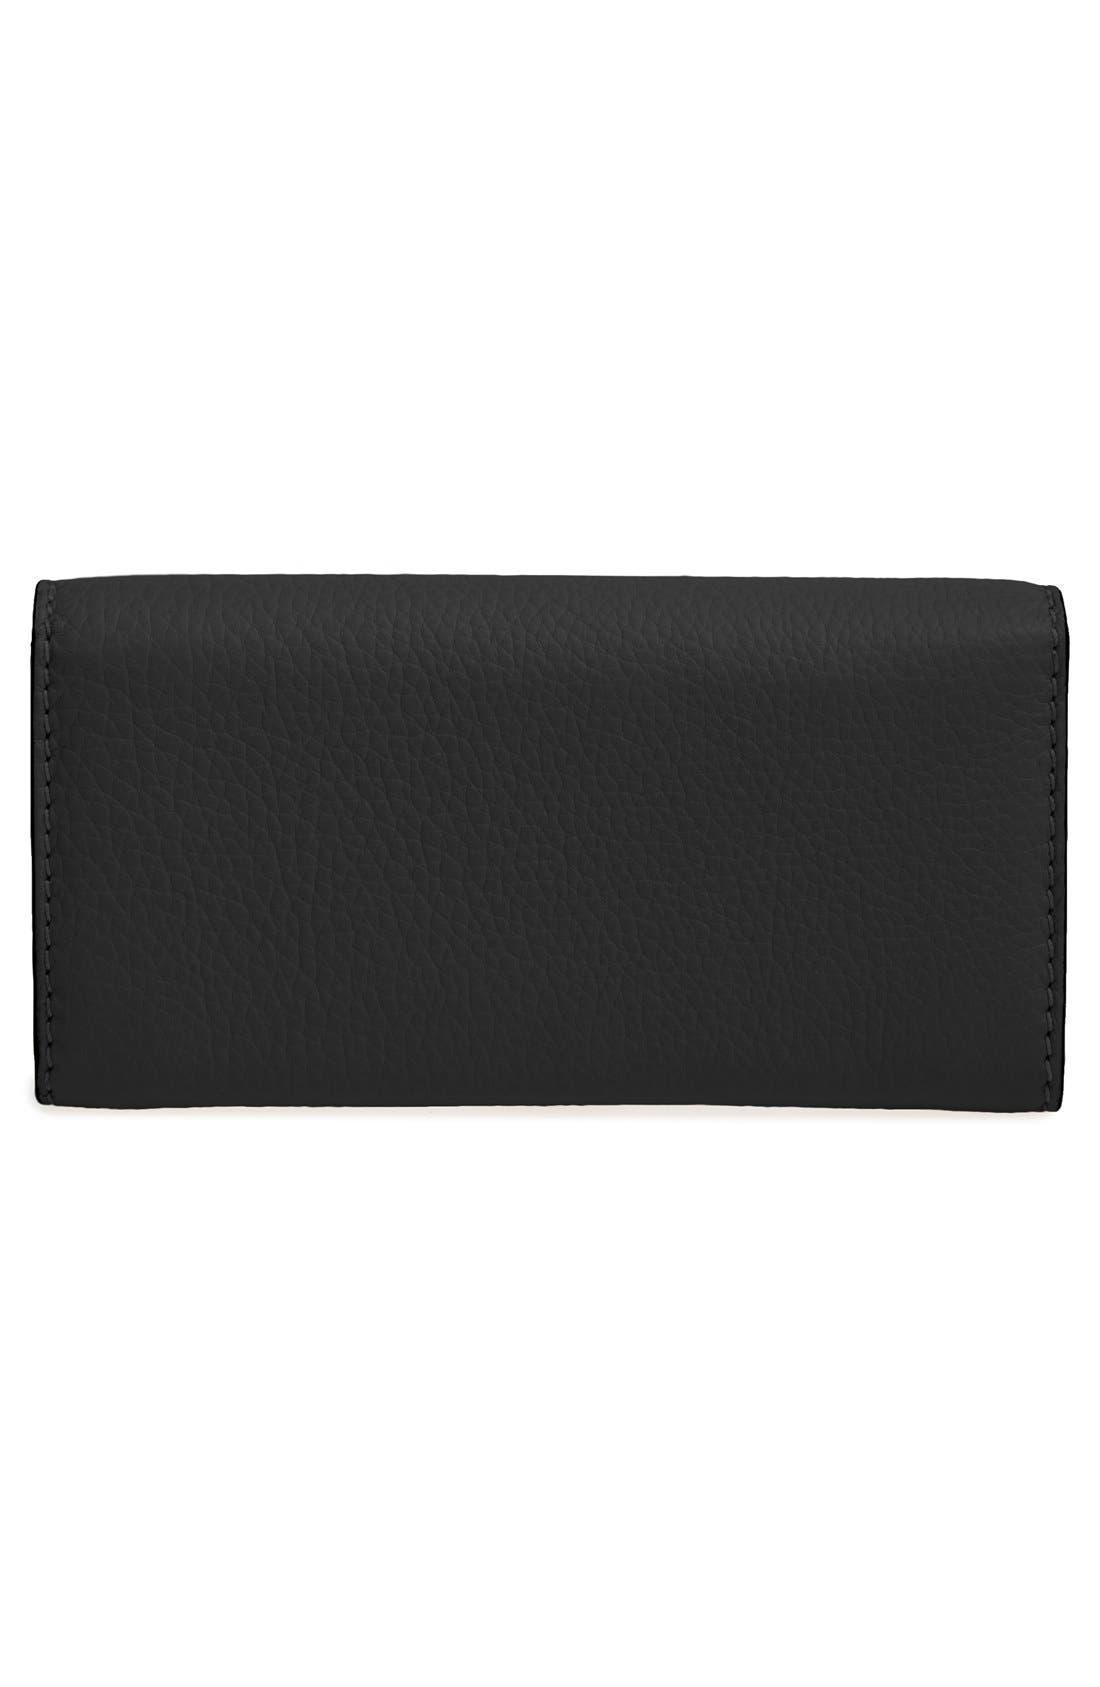 Marcie - Long Leather Flap Wallet,                             Alternate thumbnail 8, color,                             BLACK